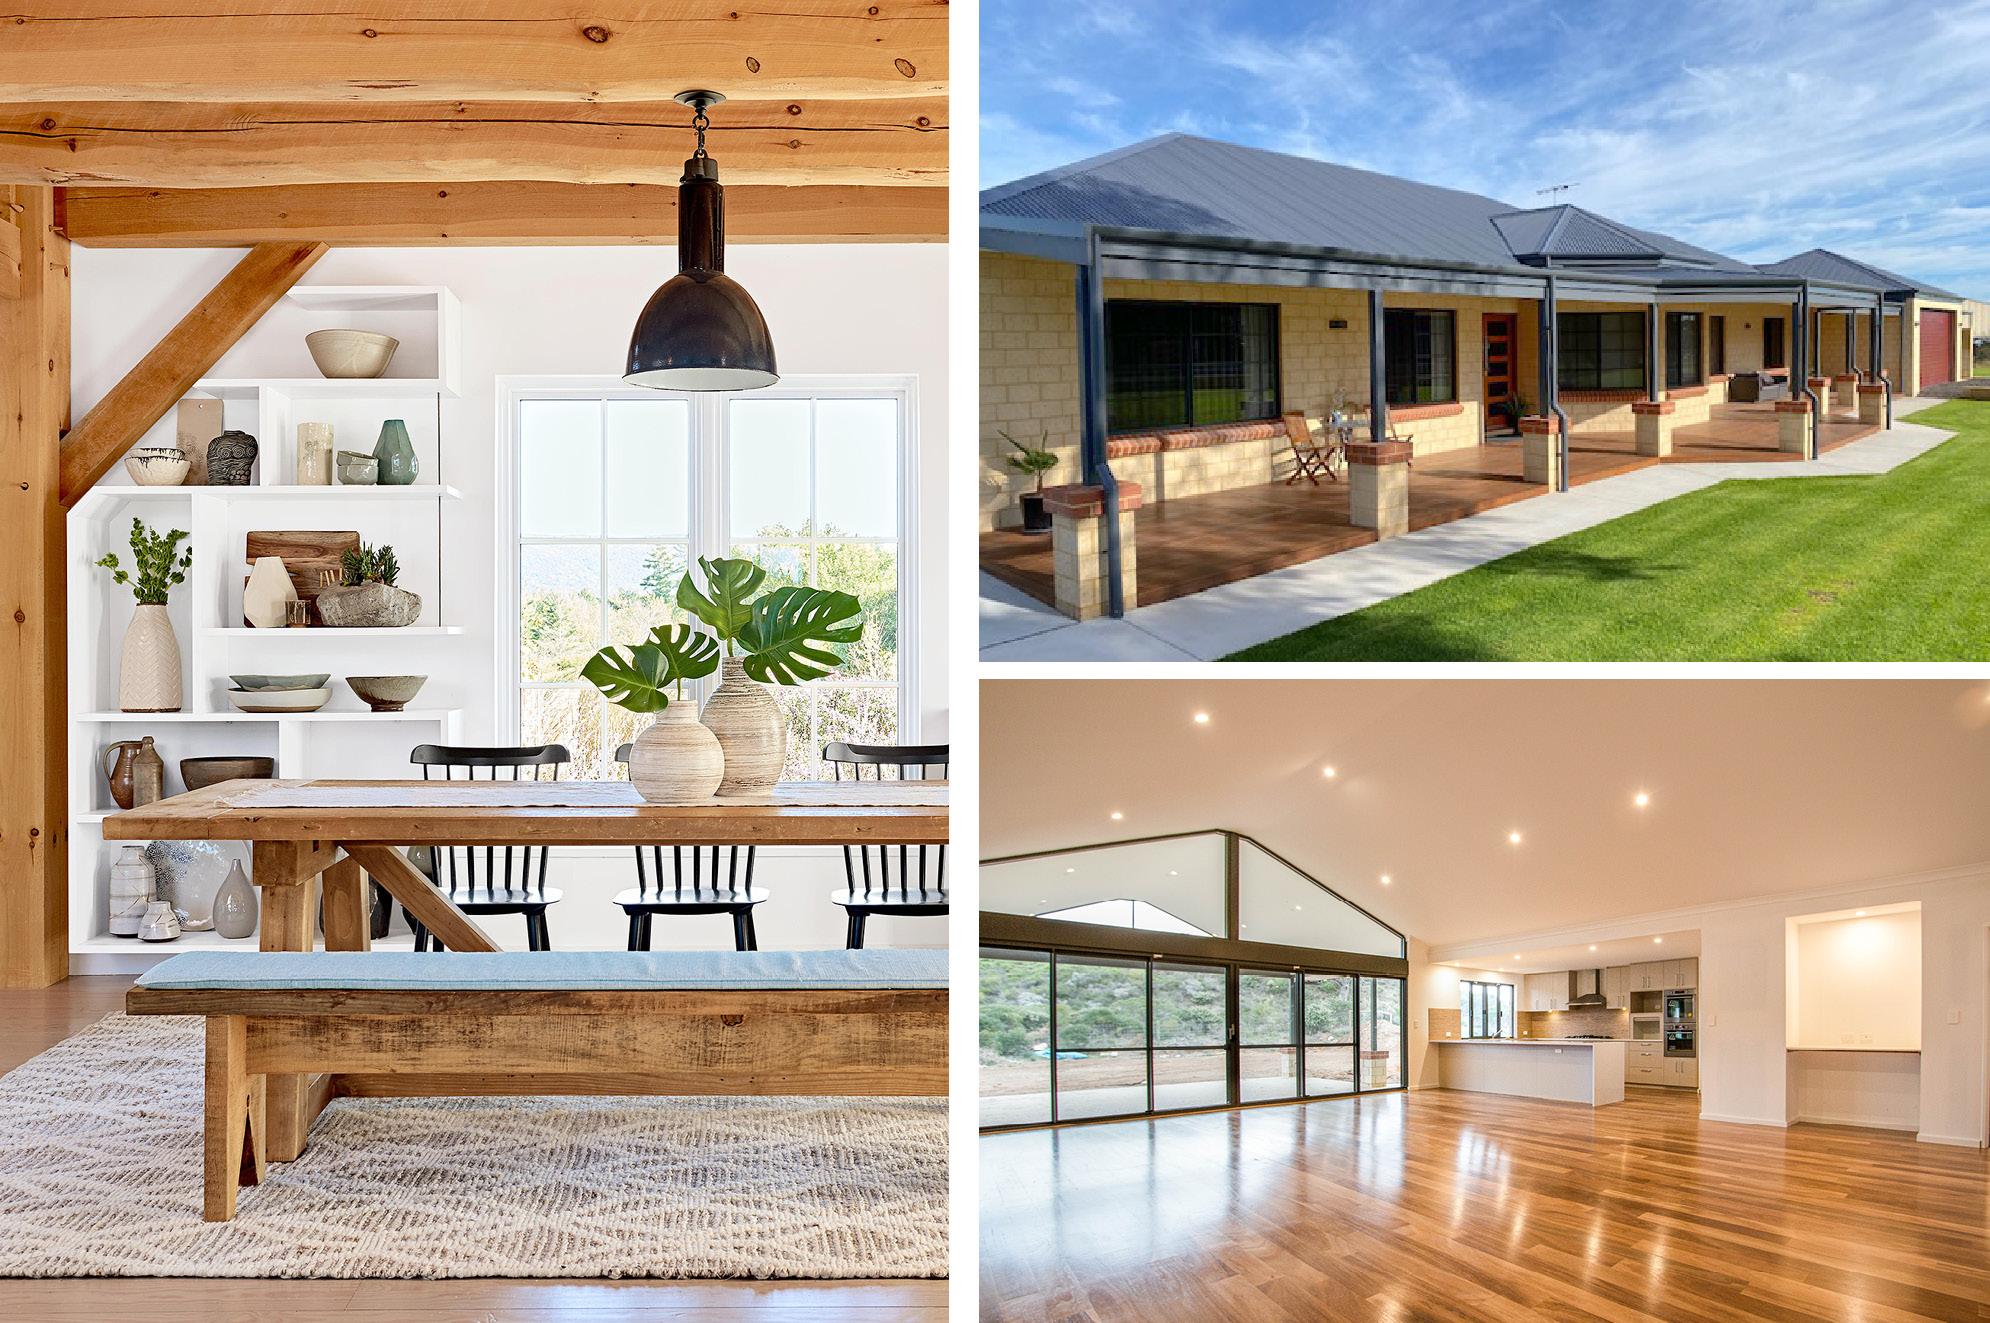 Top Design Tips to Achieve Your Dream Farmhouse Design